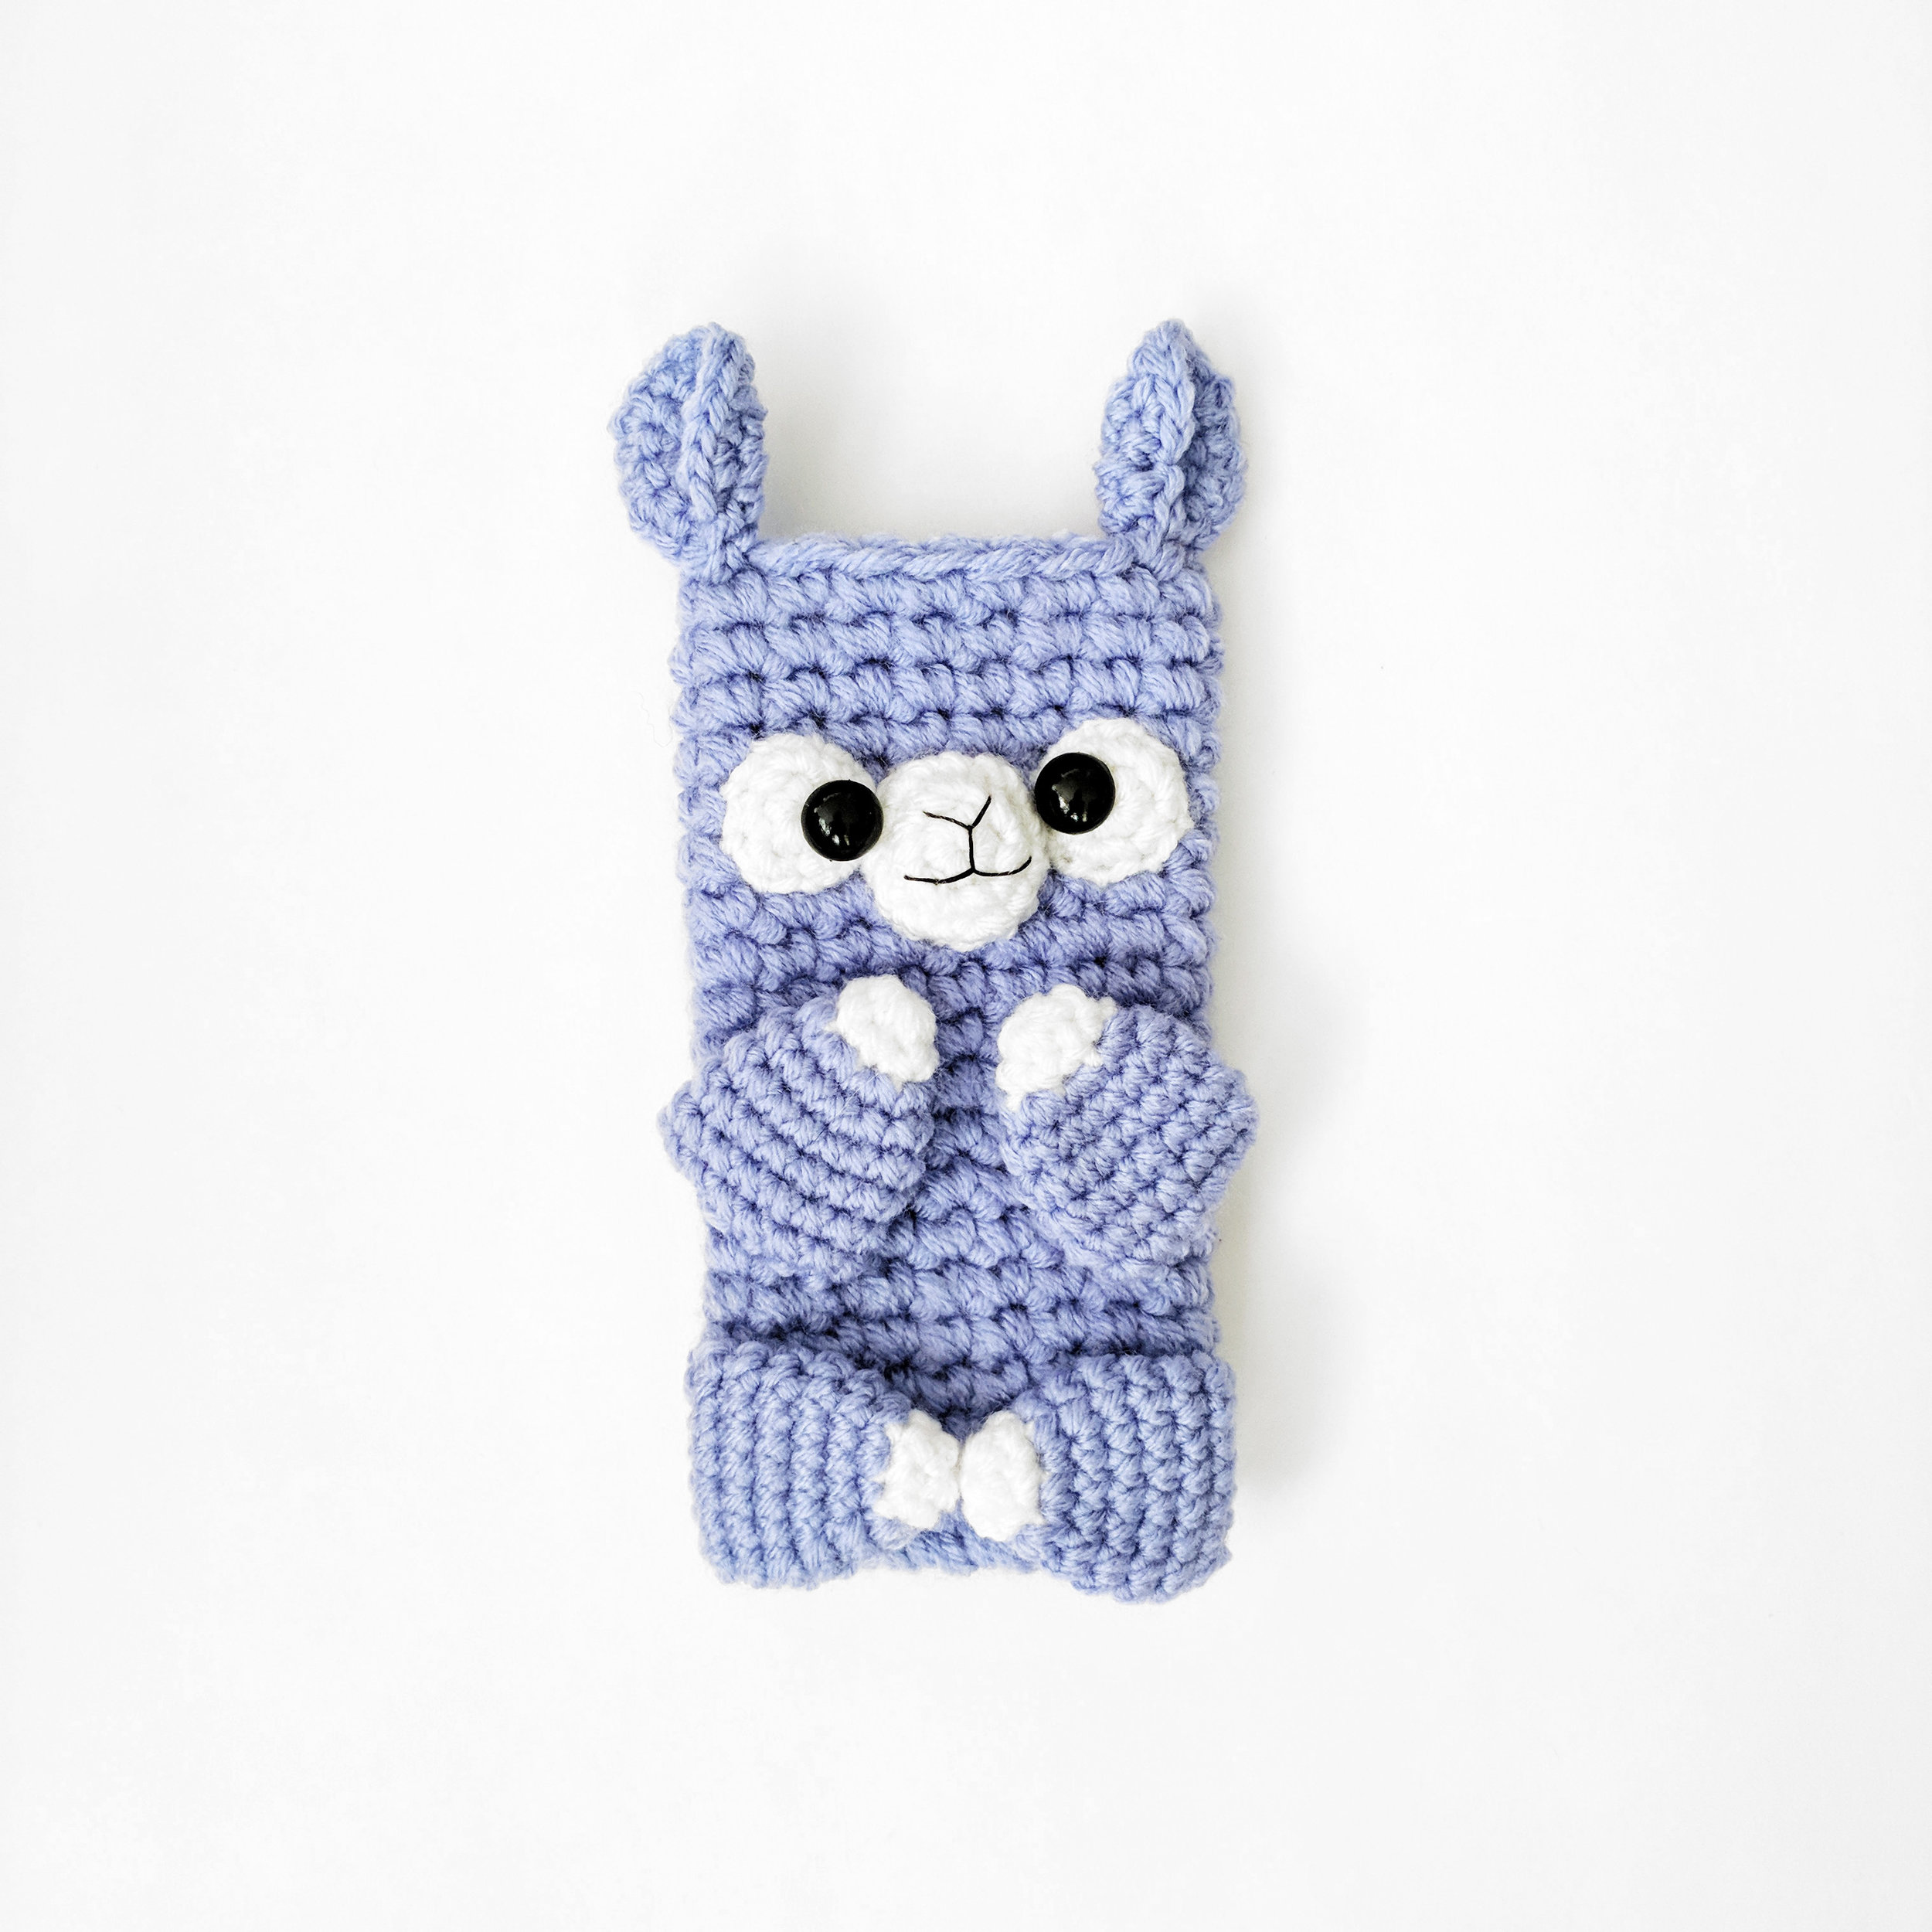 crochet-pattern-alpaca-phone-sleeve (1).jpg